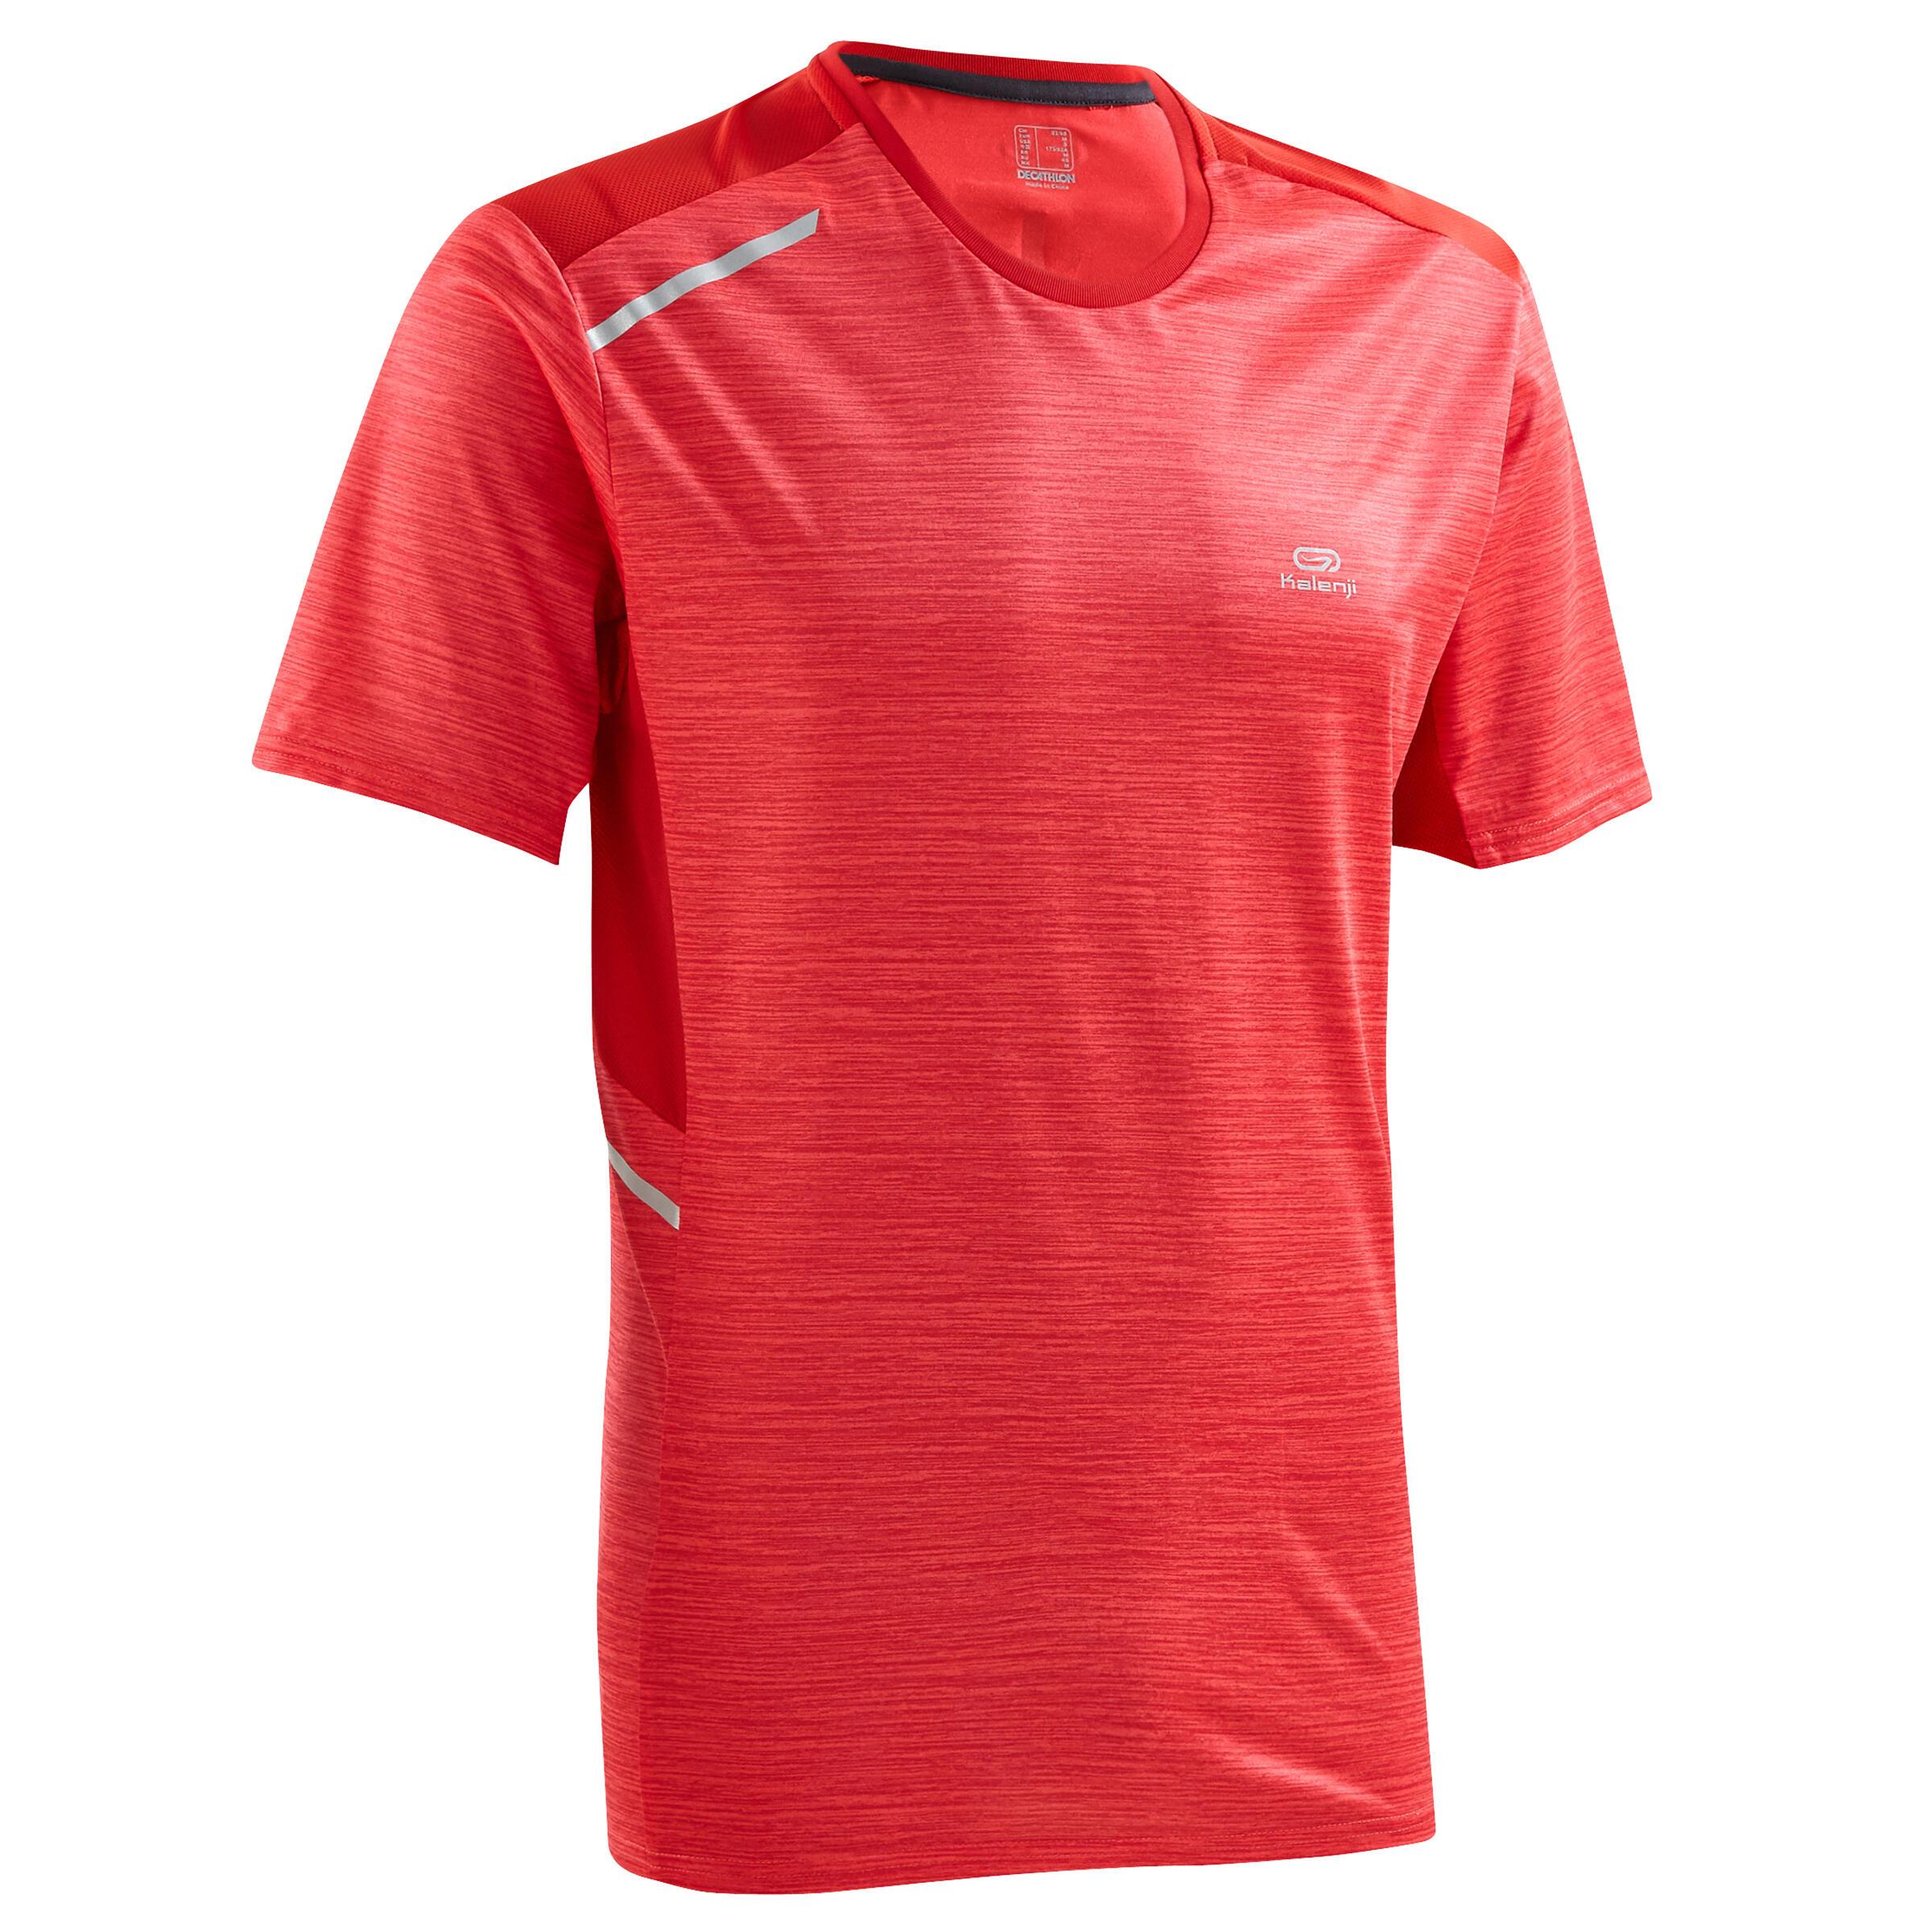 Kalenji T-shirt hardlopers Run Dry+ rood